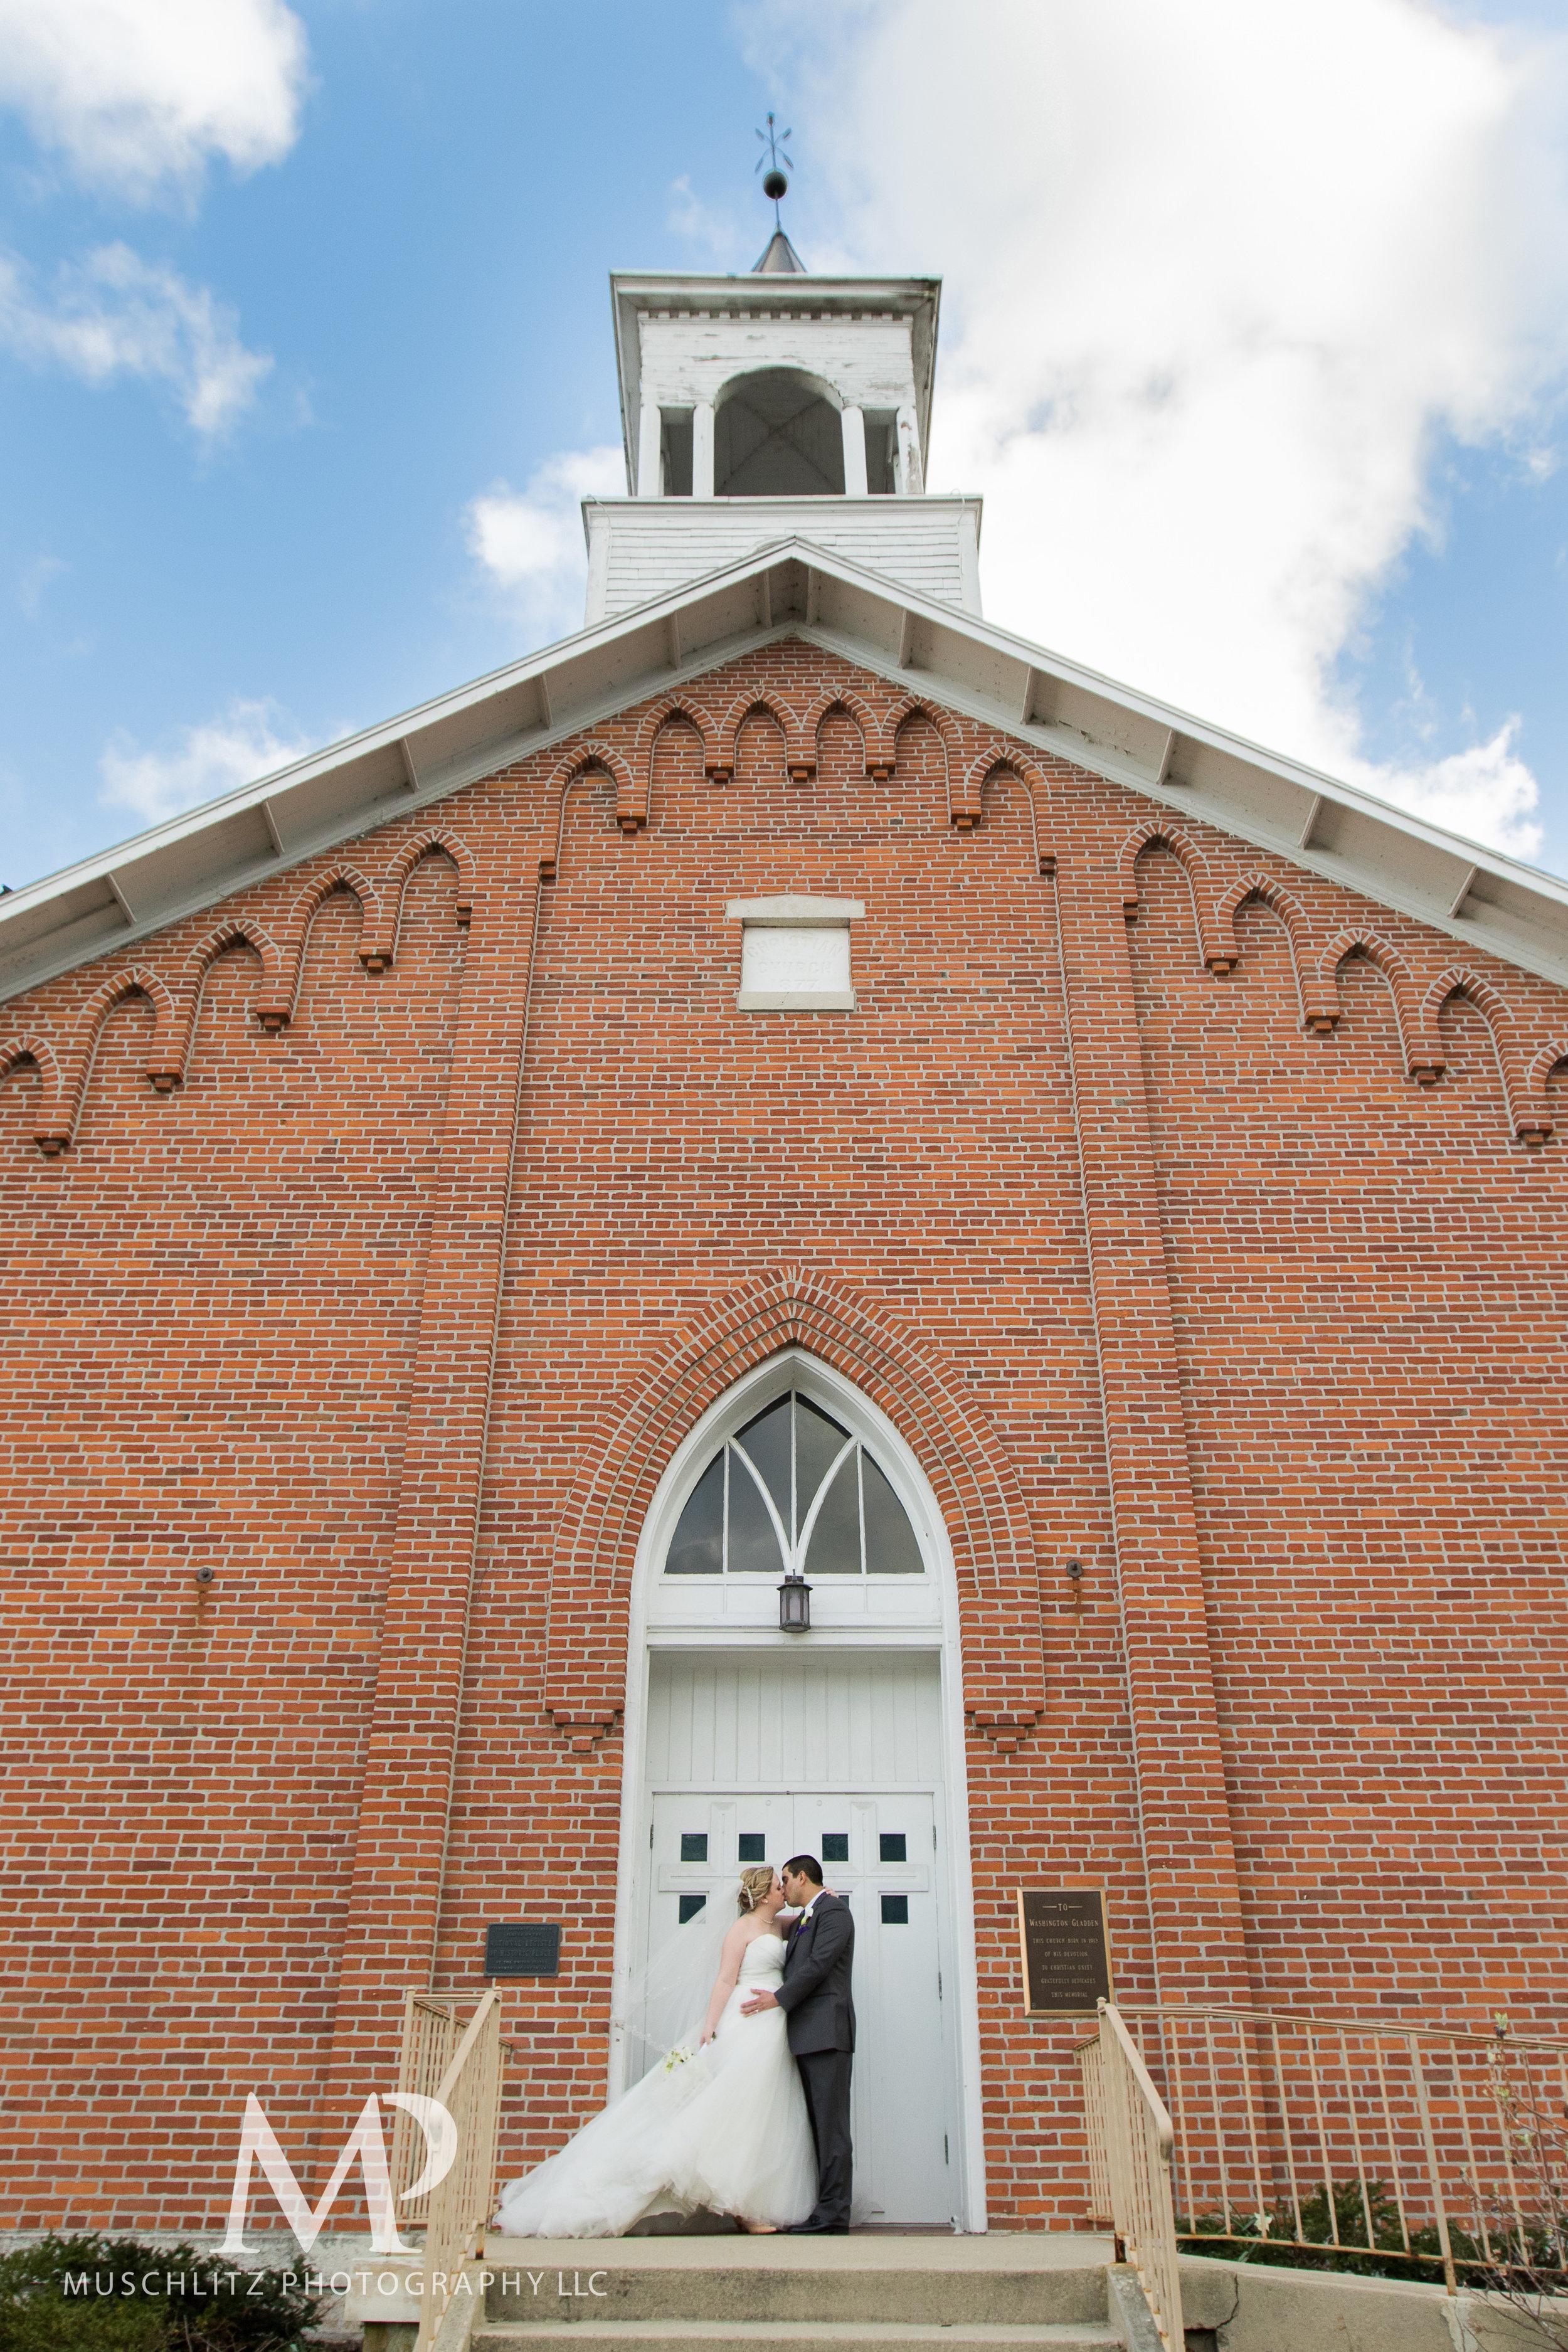 dublin-community-church-wedding-columbus-ohio-muschlitz-photography-091.JPG